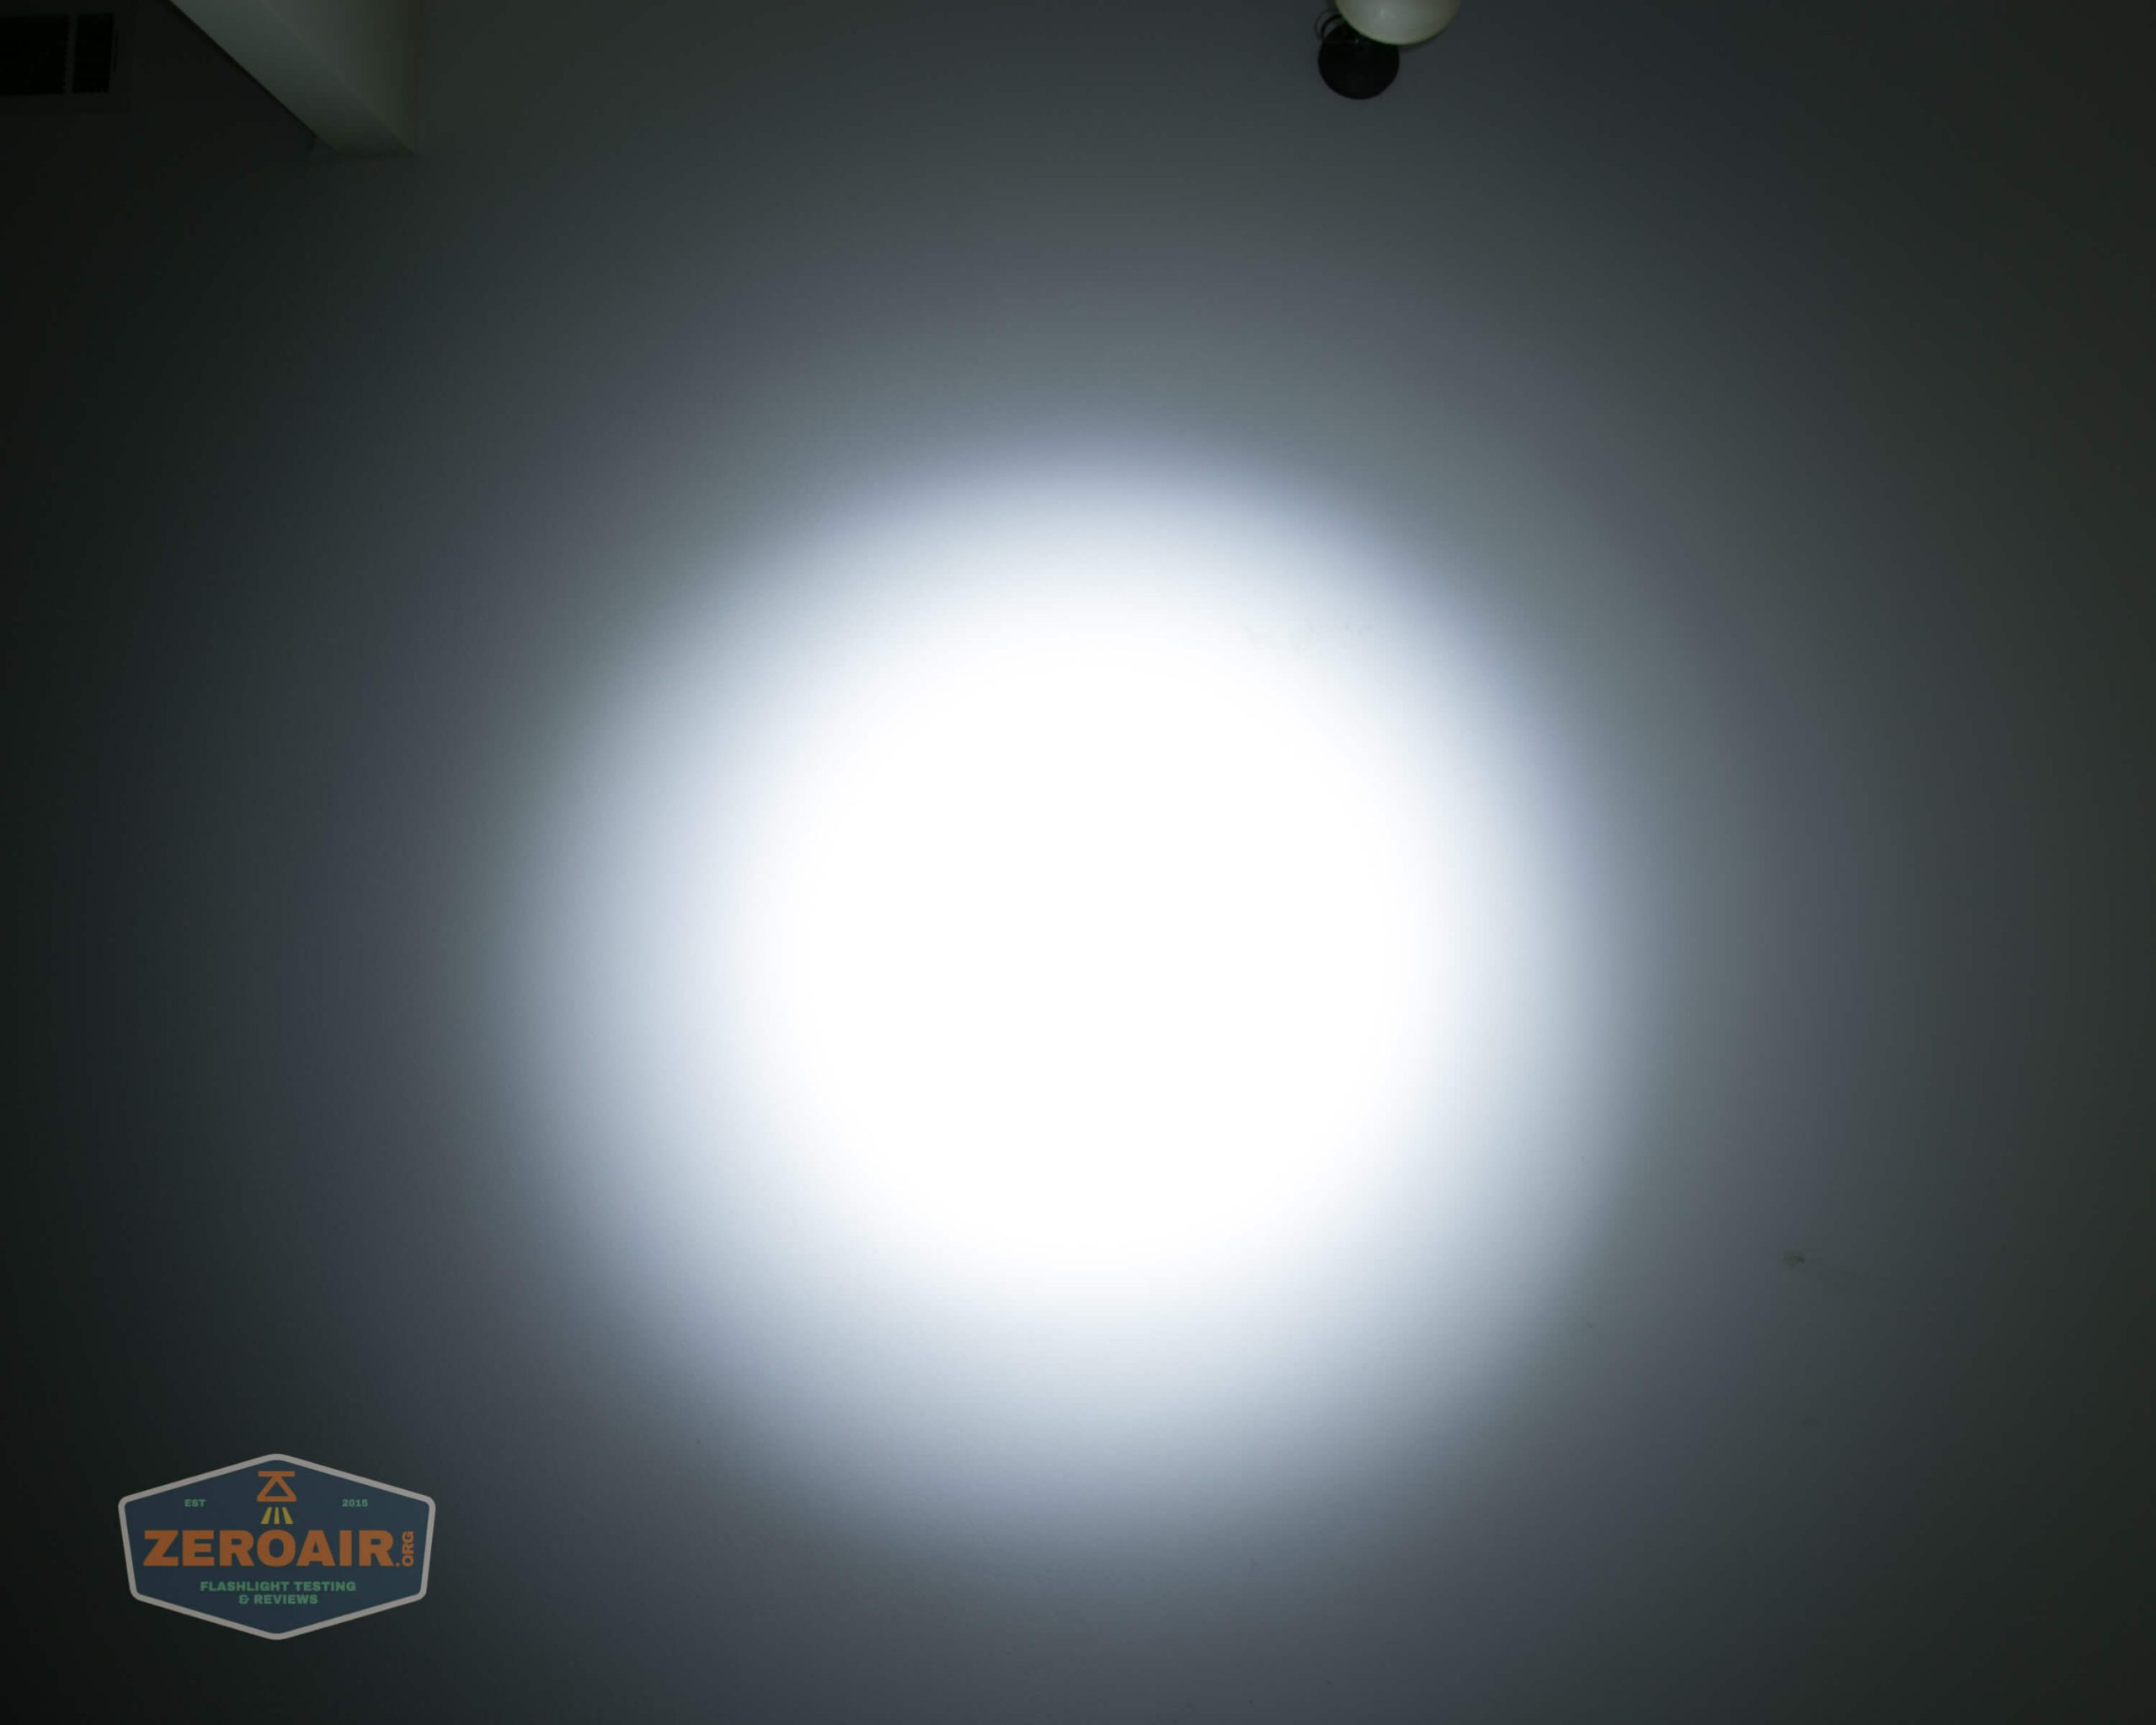 fireflylite e01 luminus sst-40 21700 beamshot ceiling 8